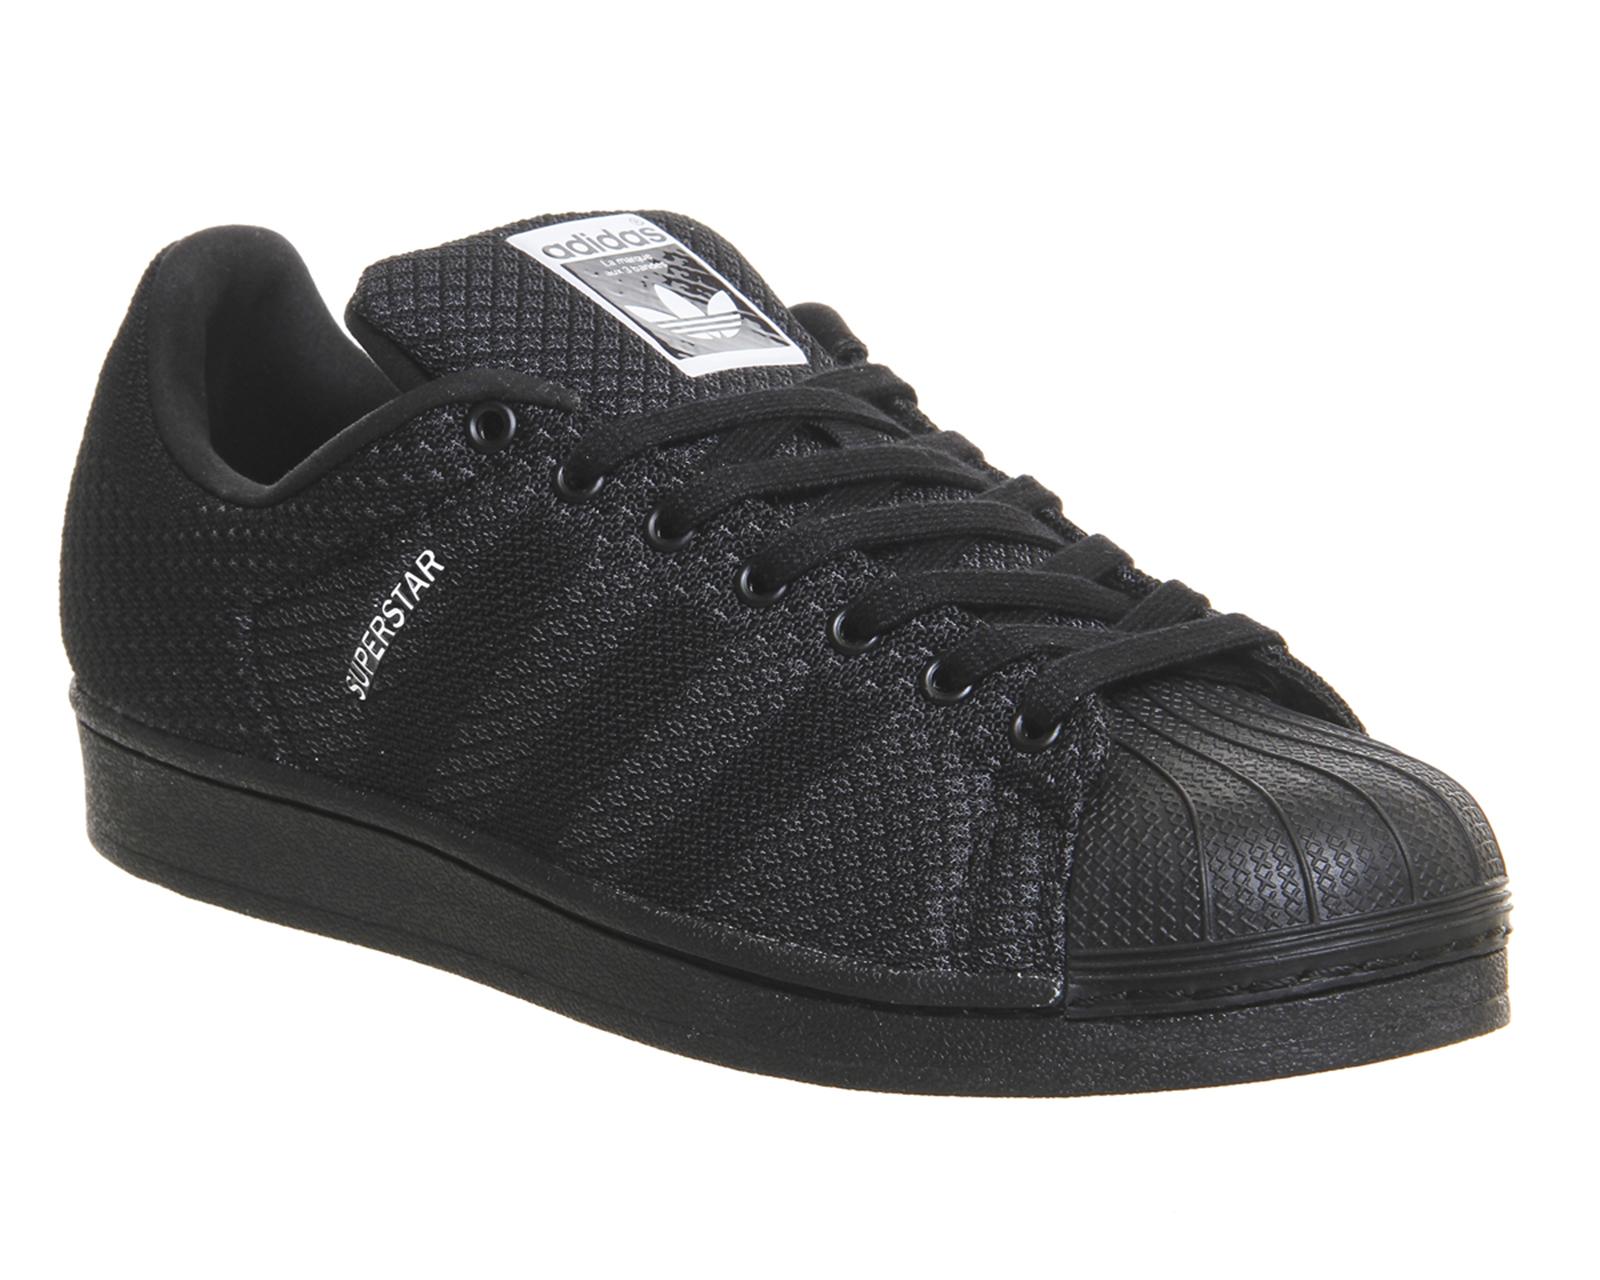 mens adidas superstar 2 black white weave pack trainers. Black Bedroom Furniture Sets. Home Design Ideas